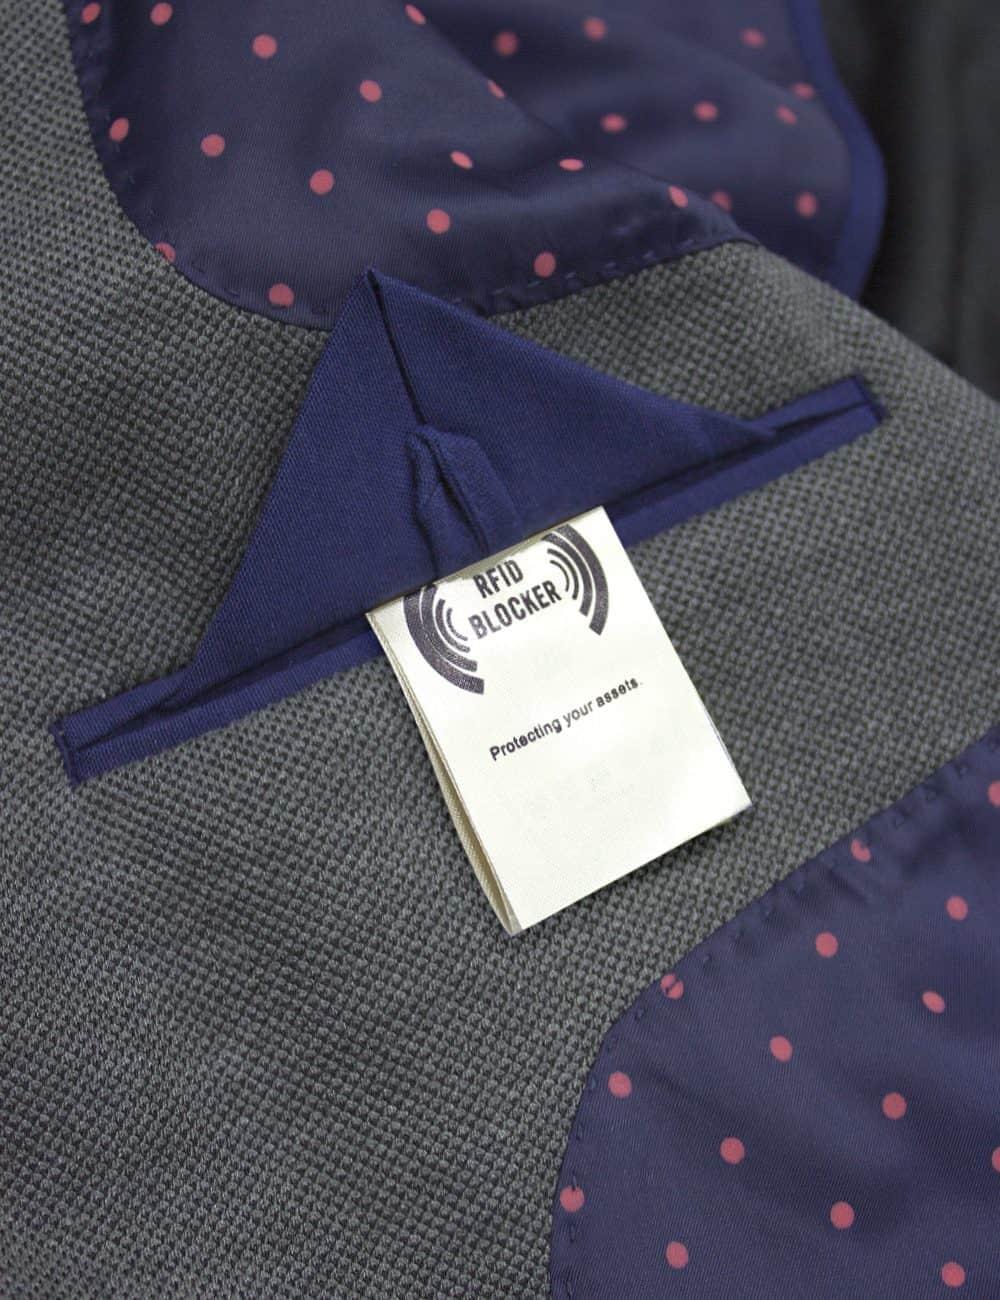 Slim Fit Charcoal Grey Knitted Blazer - B1B1.1